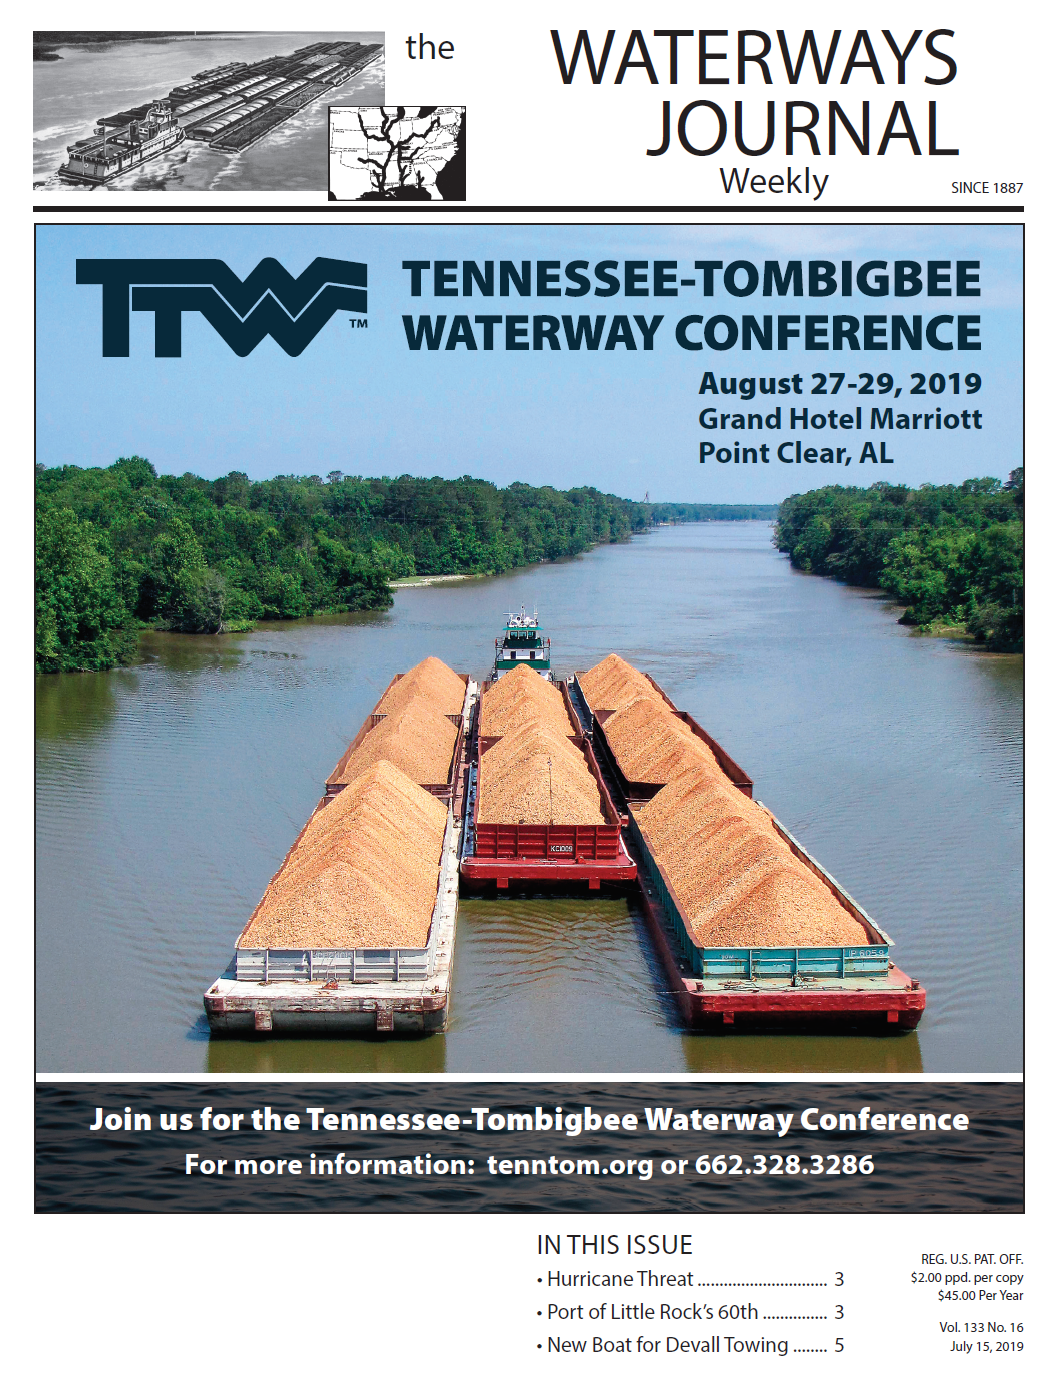 The Waterways Journal